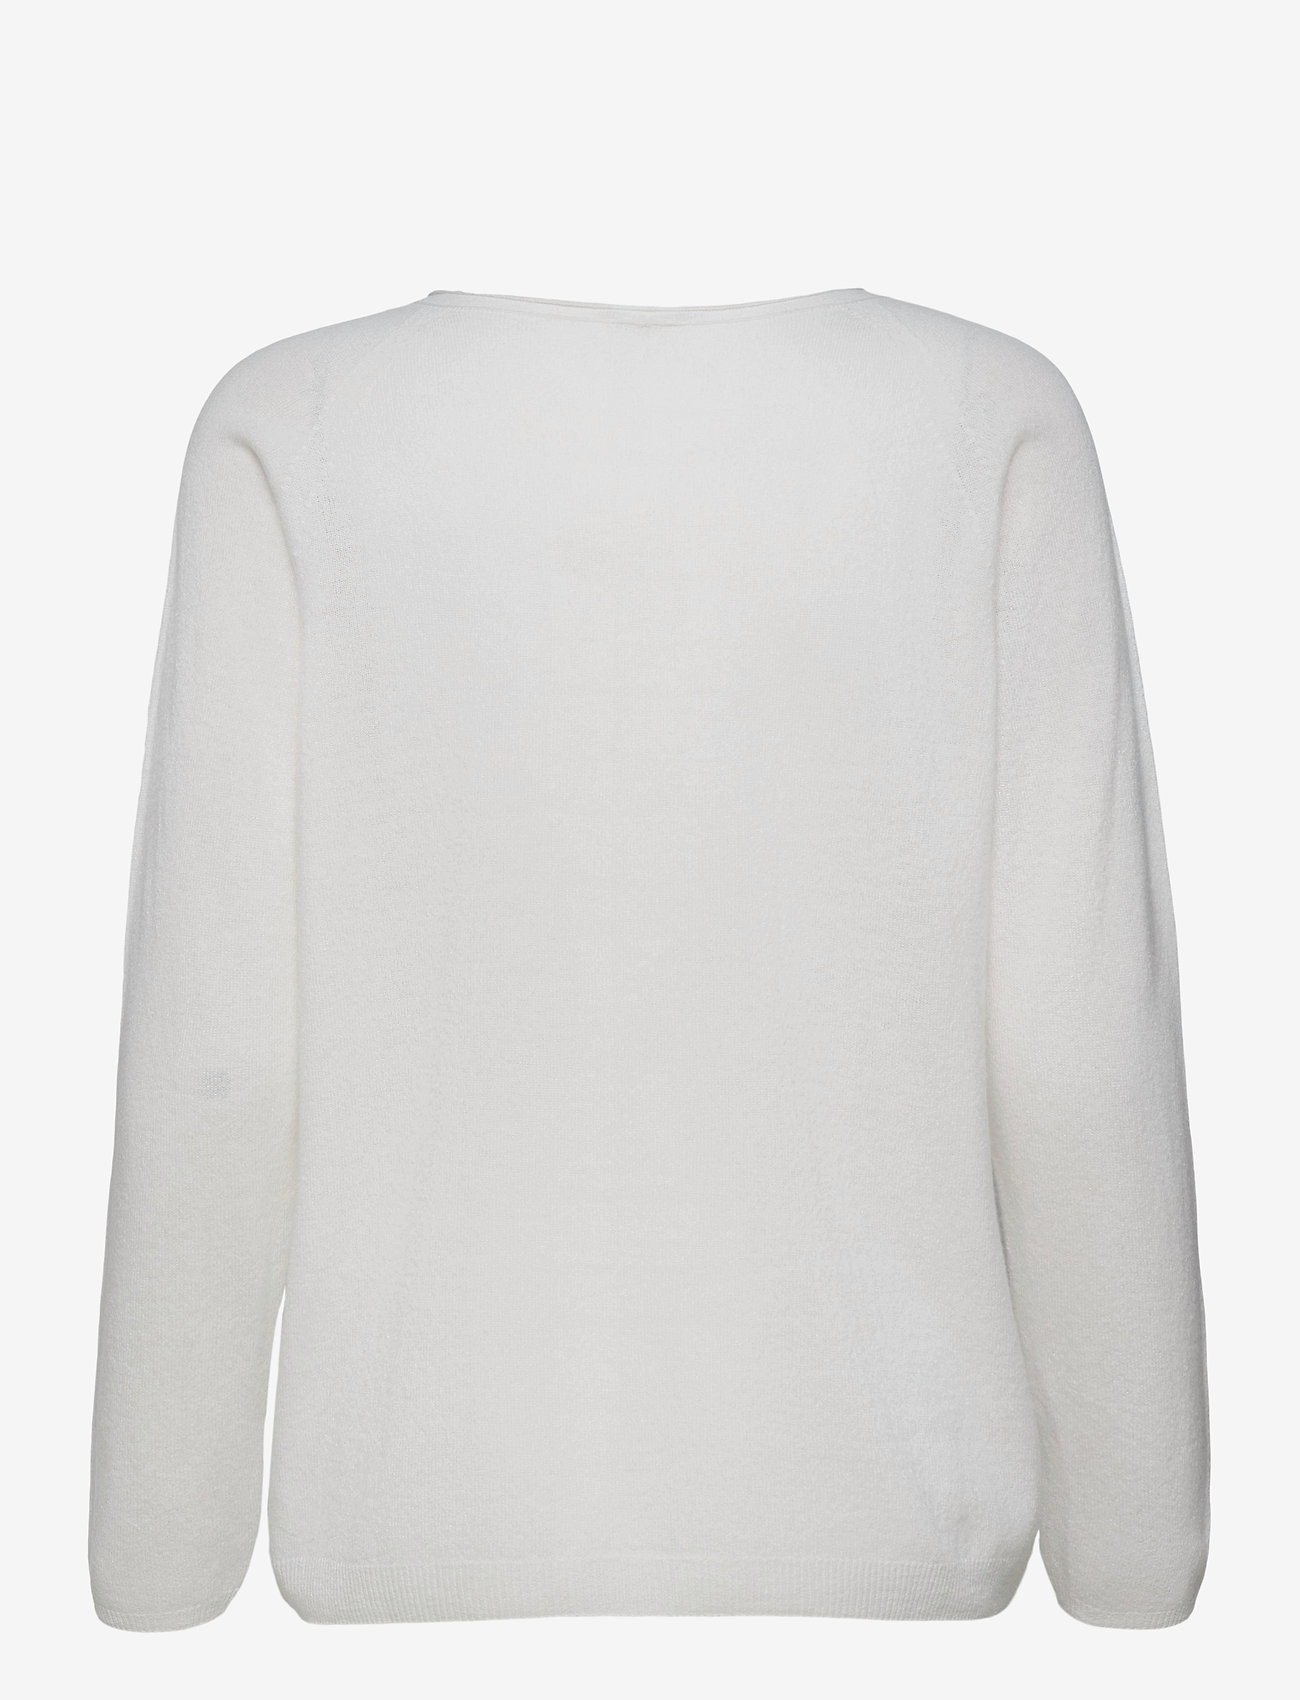 Max Mara Leisure - SMIRNE - sweaters - white - 1